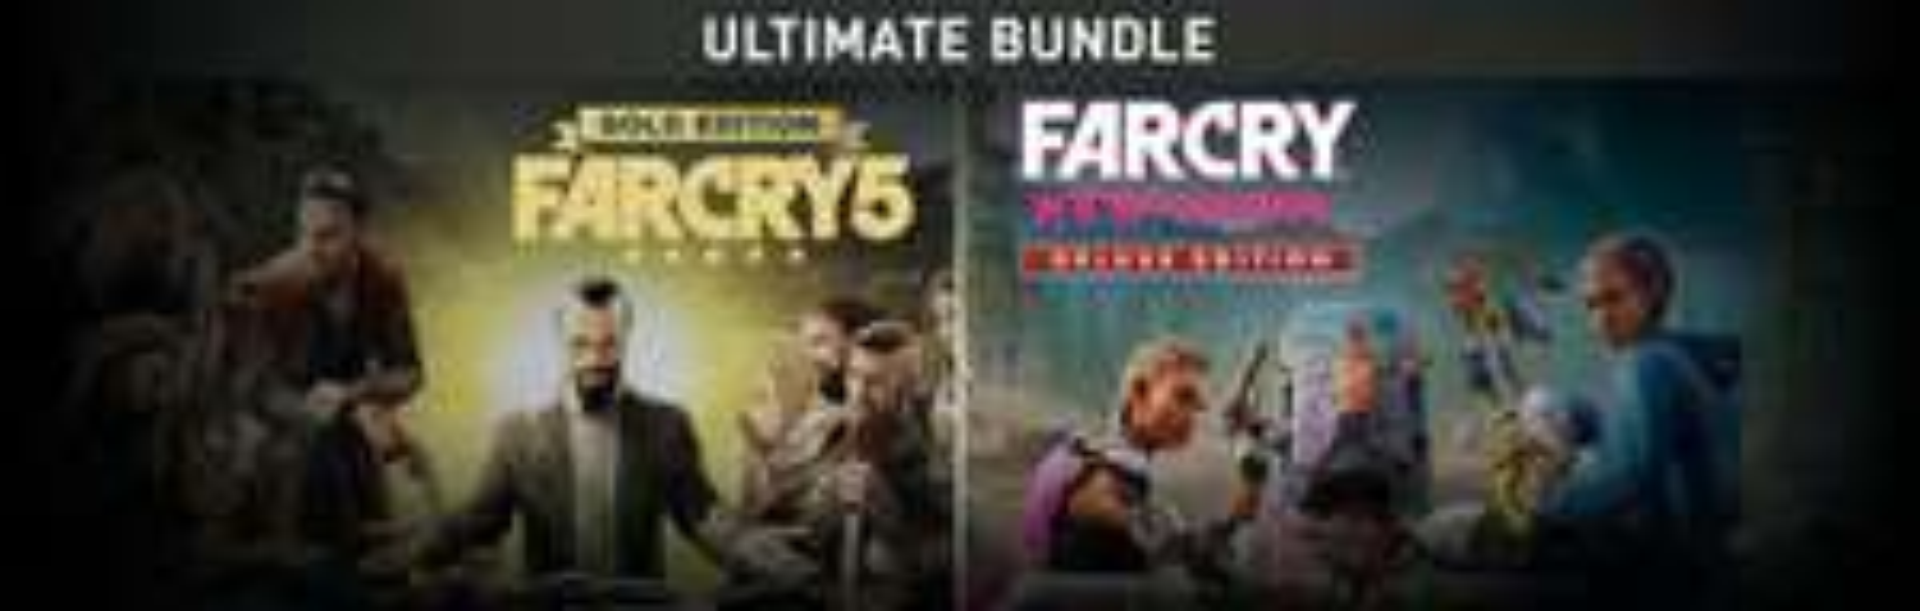 Far Cry 5 Gold Edition + Far Cry New Dawn Deluxe Edition Bundle - £14.99 @ Fanatical